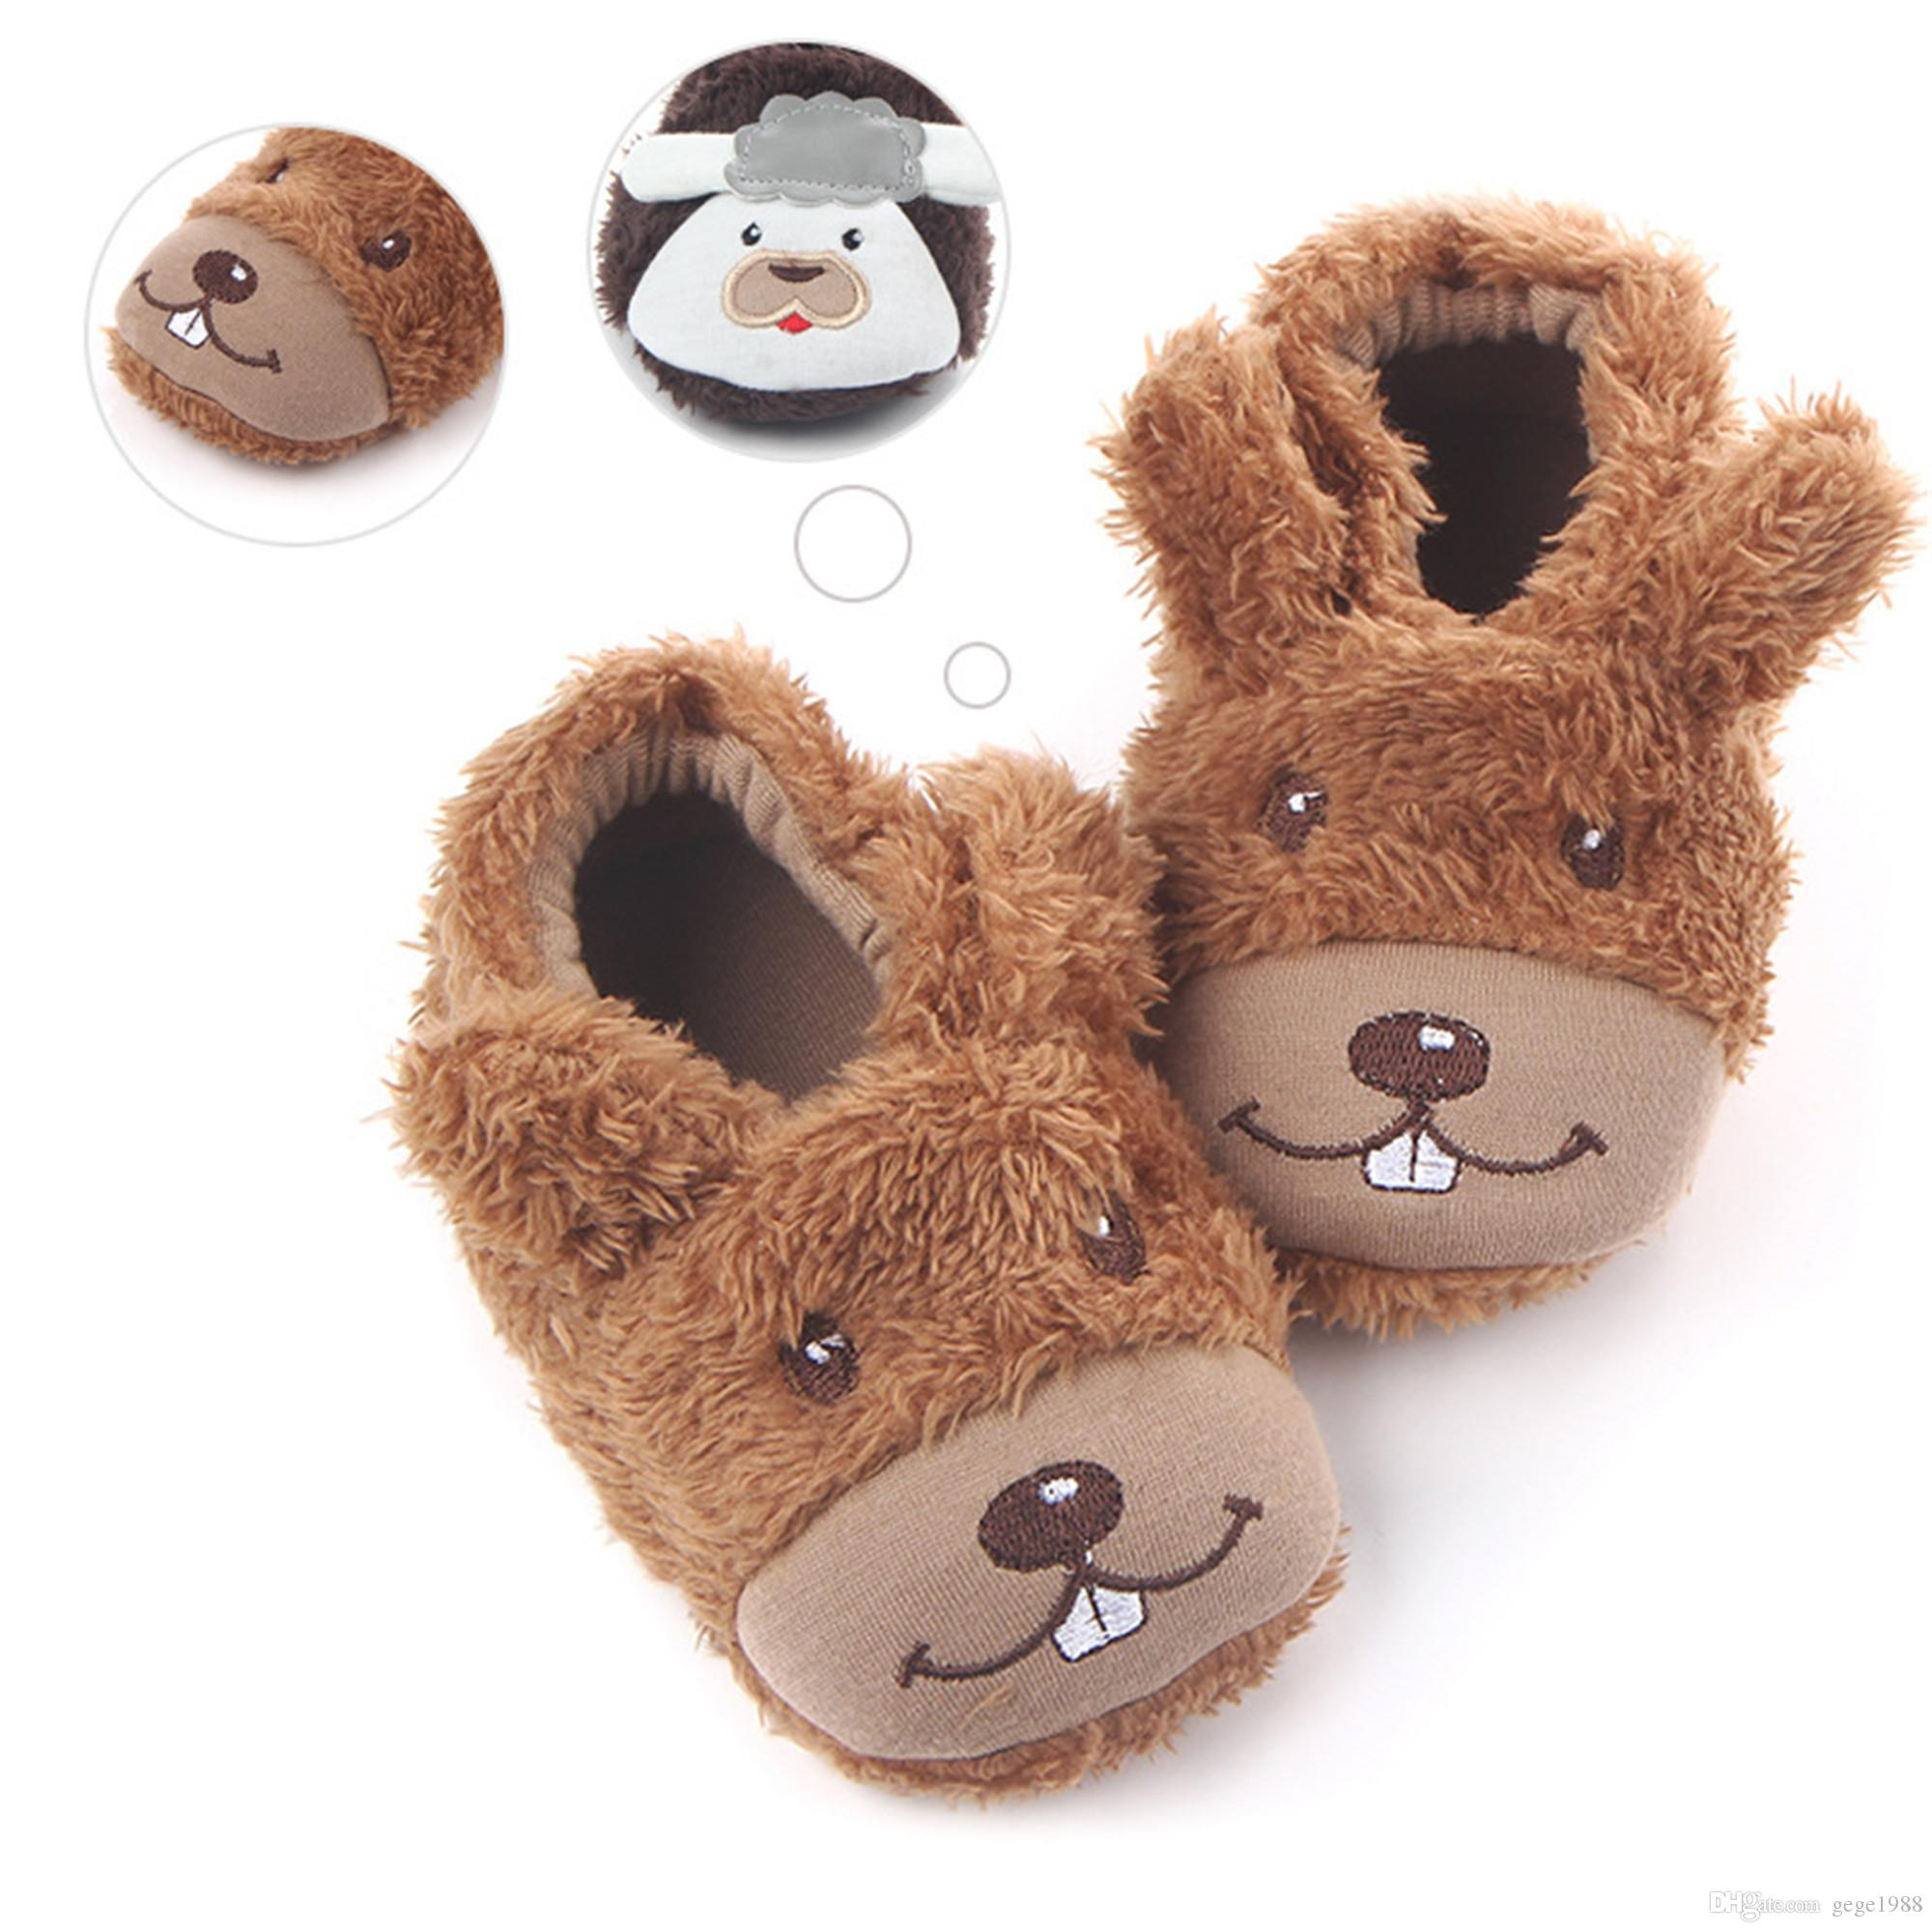 2018 Cute Cartoon Dog Cow Baby Home Slippers Kids Crib Shoes Plush